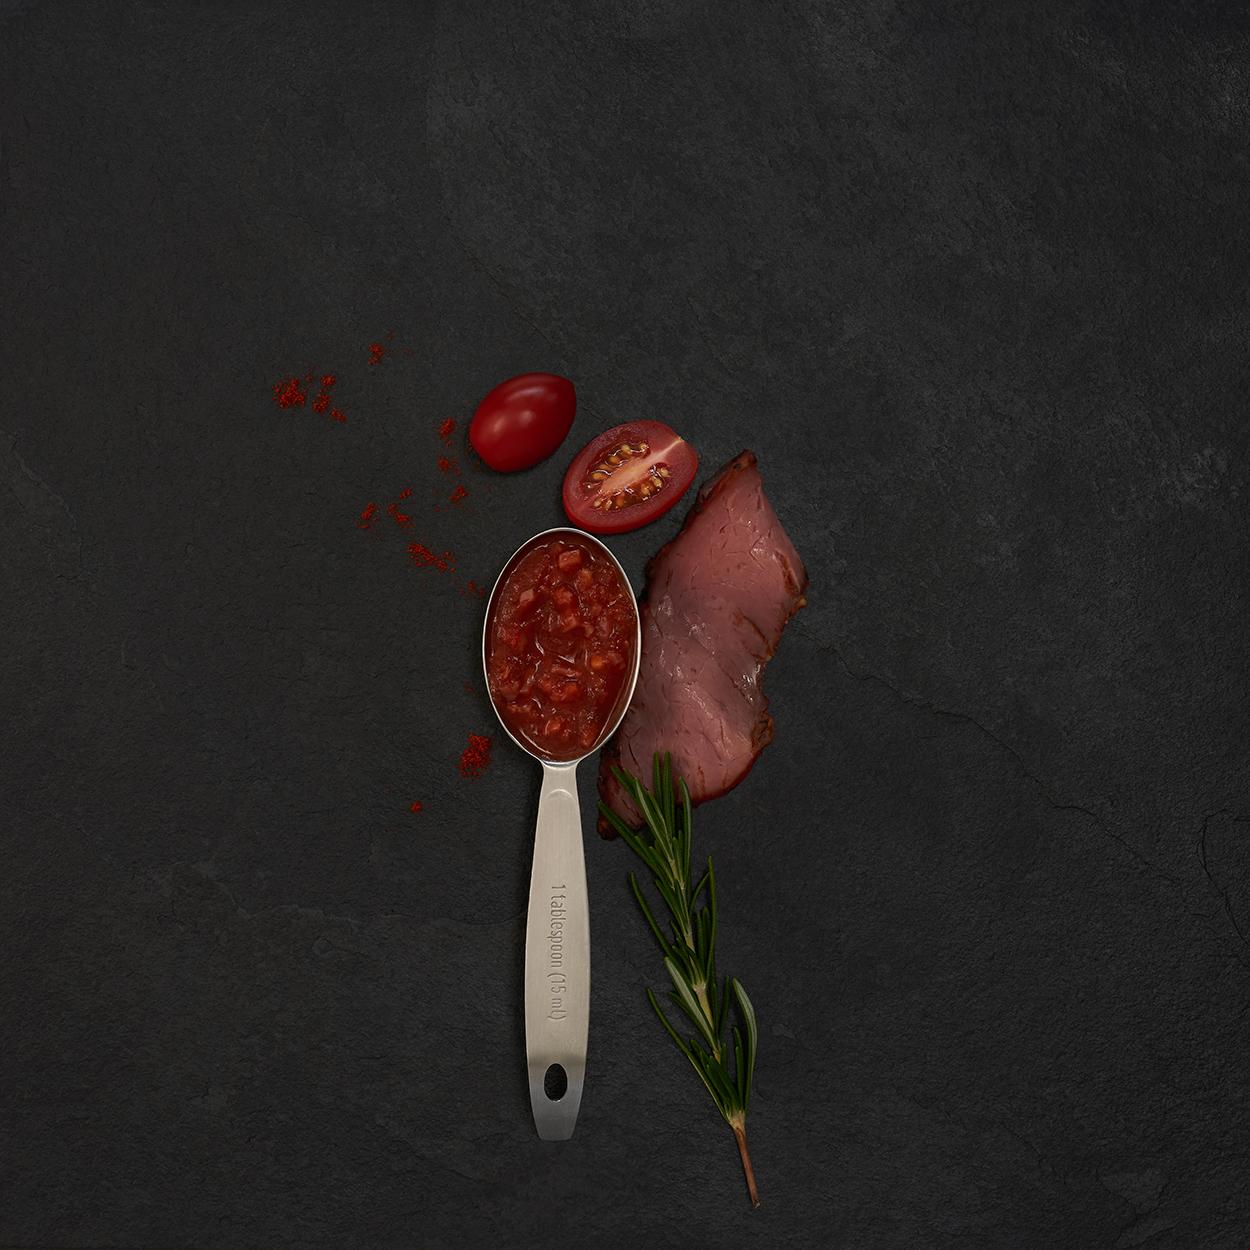 KitchenLab_Orfe_1724400_SmokedMeat_VF copie.jpg